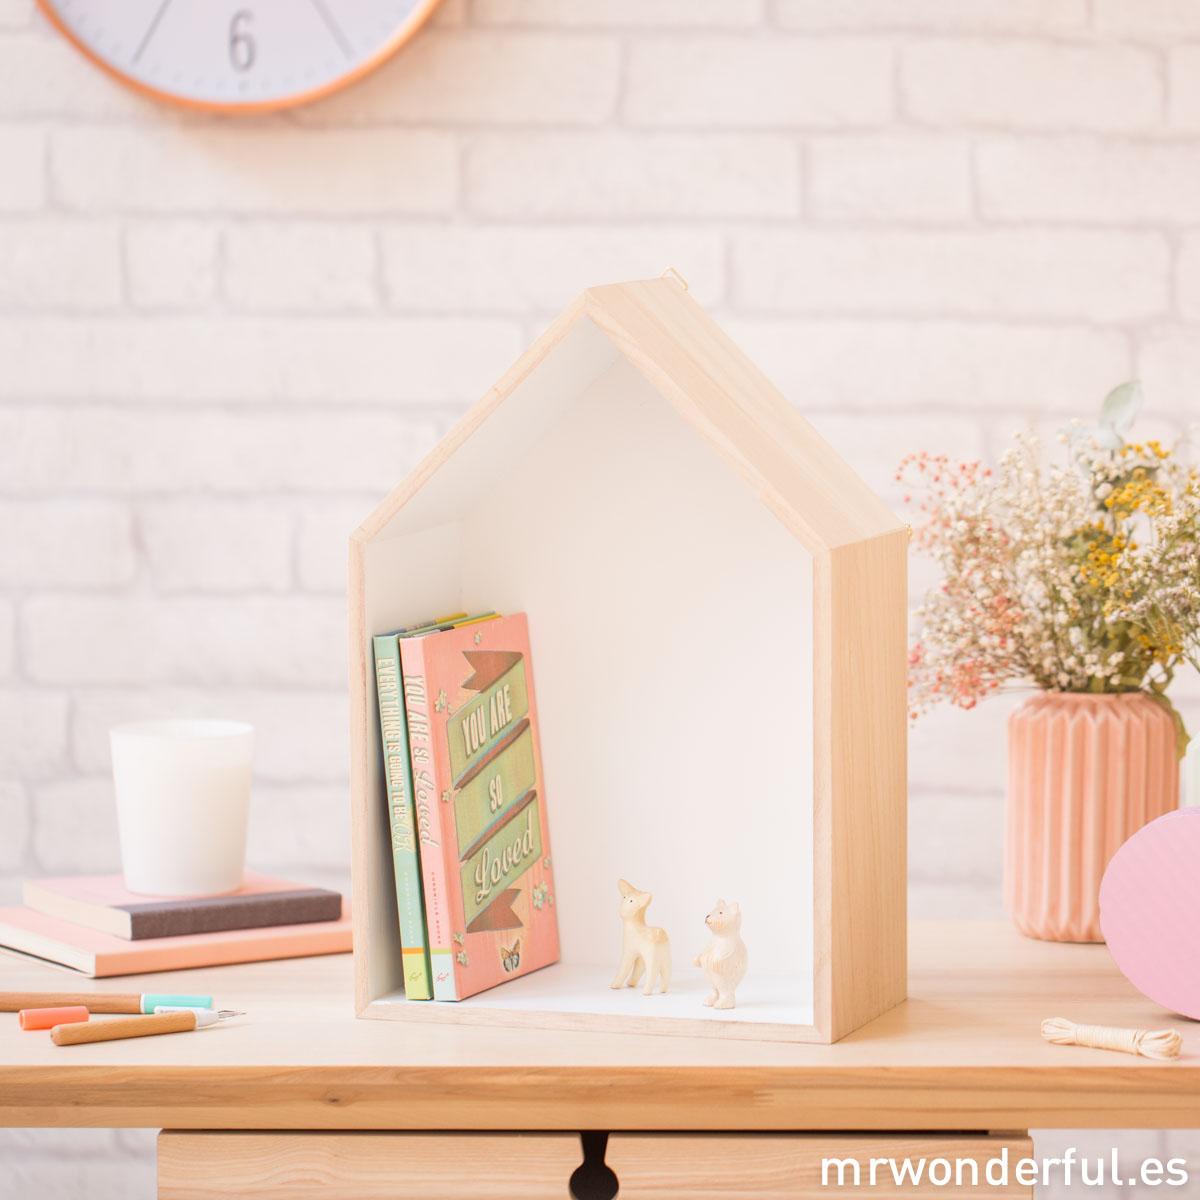 mrwonderful_PRA02792_estantes-madera-casa_bloomingville-21-Editar